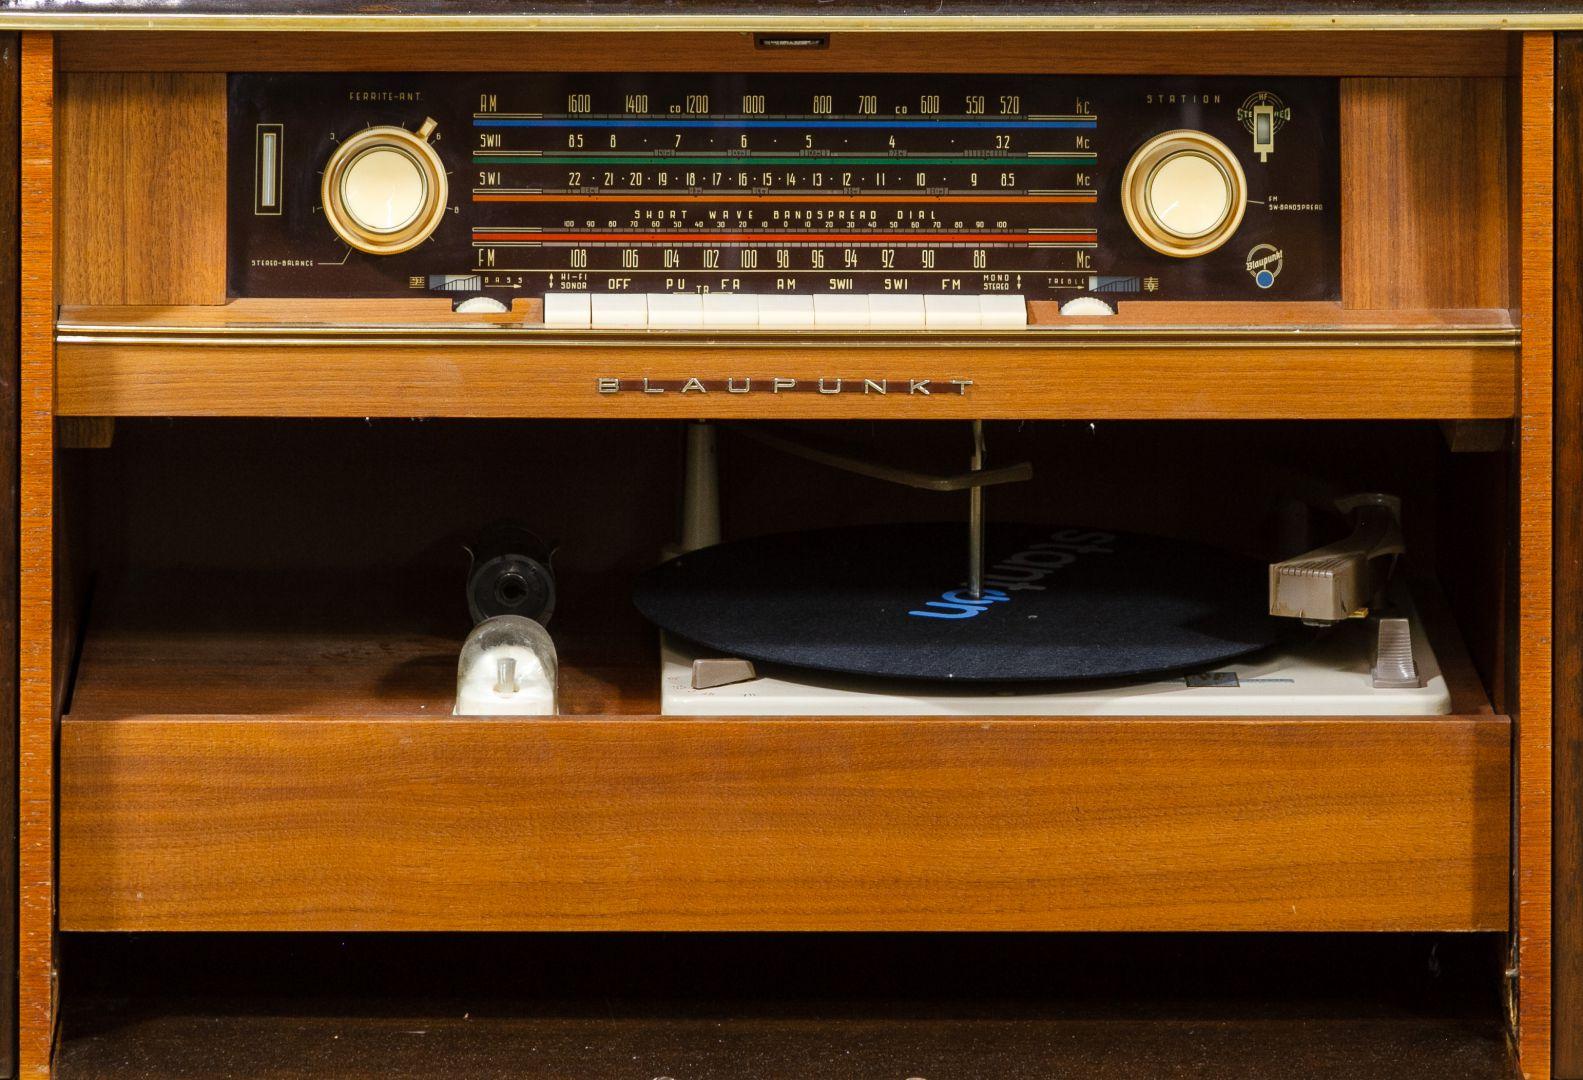 Lot 411 Blaupunkt Valencia Deluxe Console Stereo